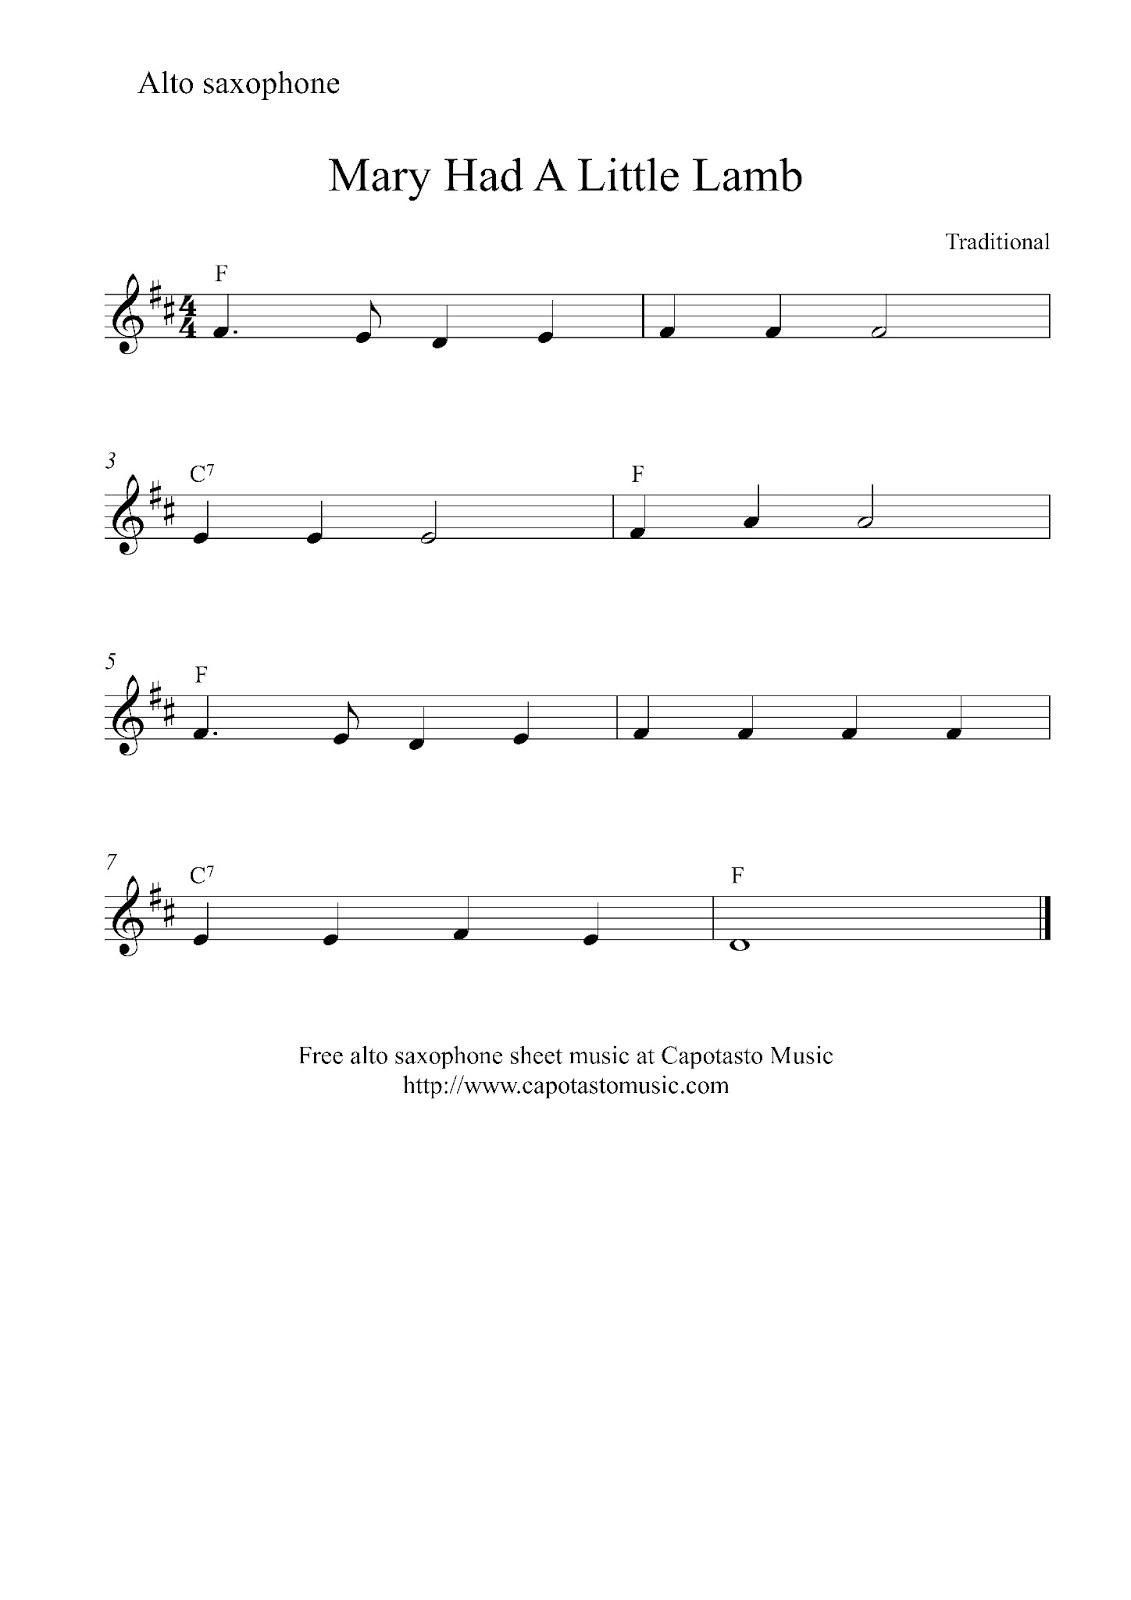 Free Easy Alto Saxophone Sheet Music Mary Had A Little Lamb